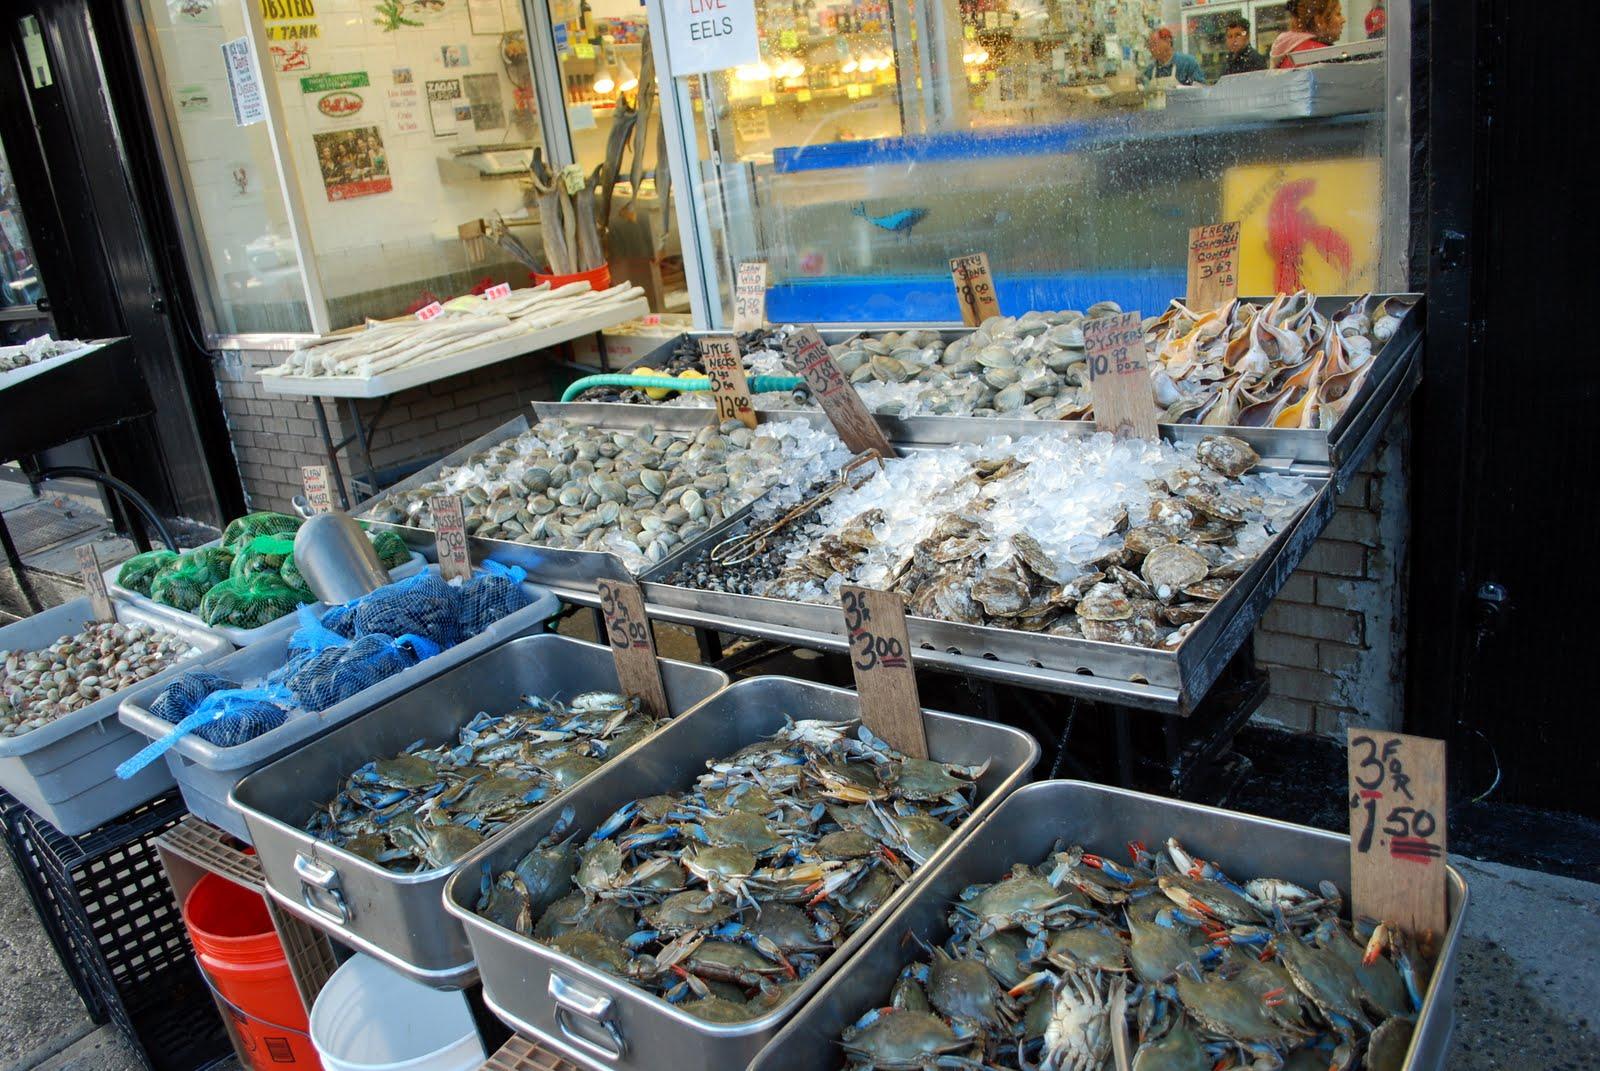 Mille fiori favoriti arthur avenue in the bronx is for Fish market bronx